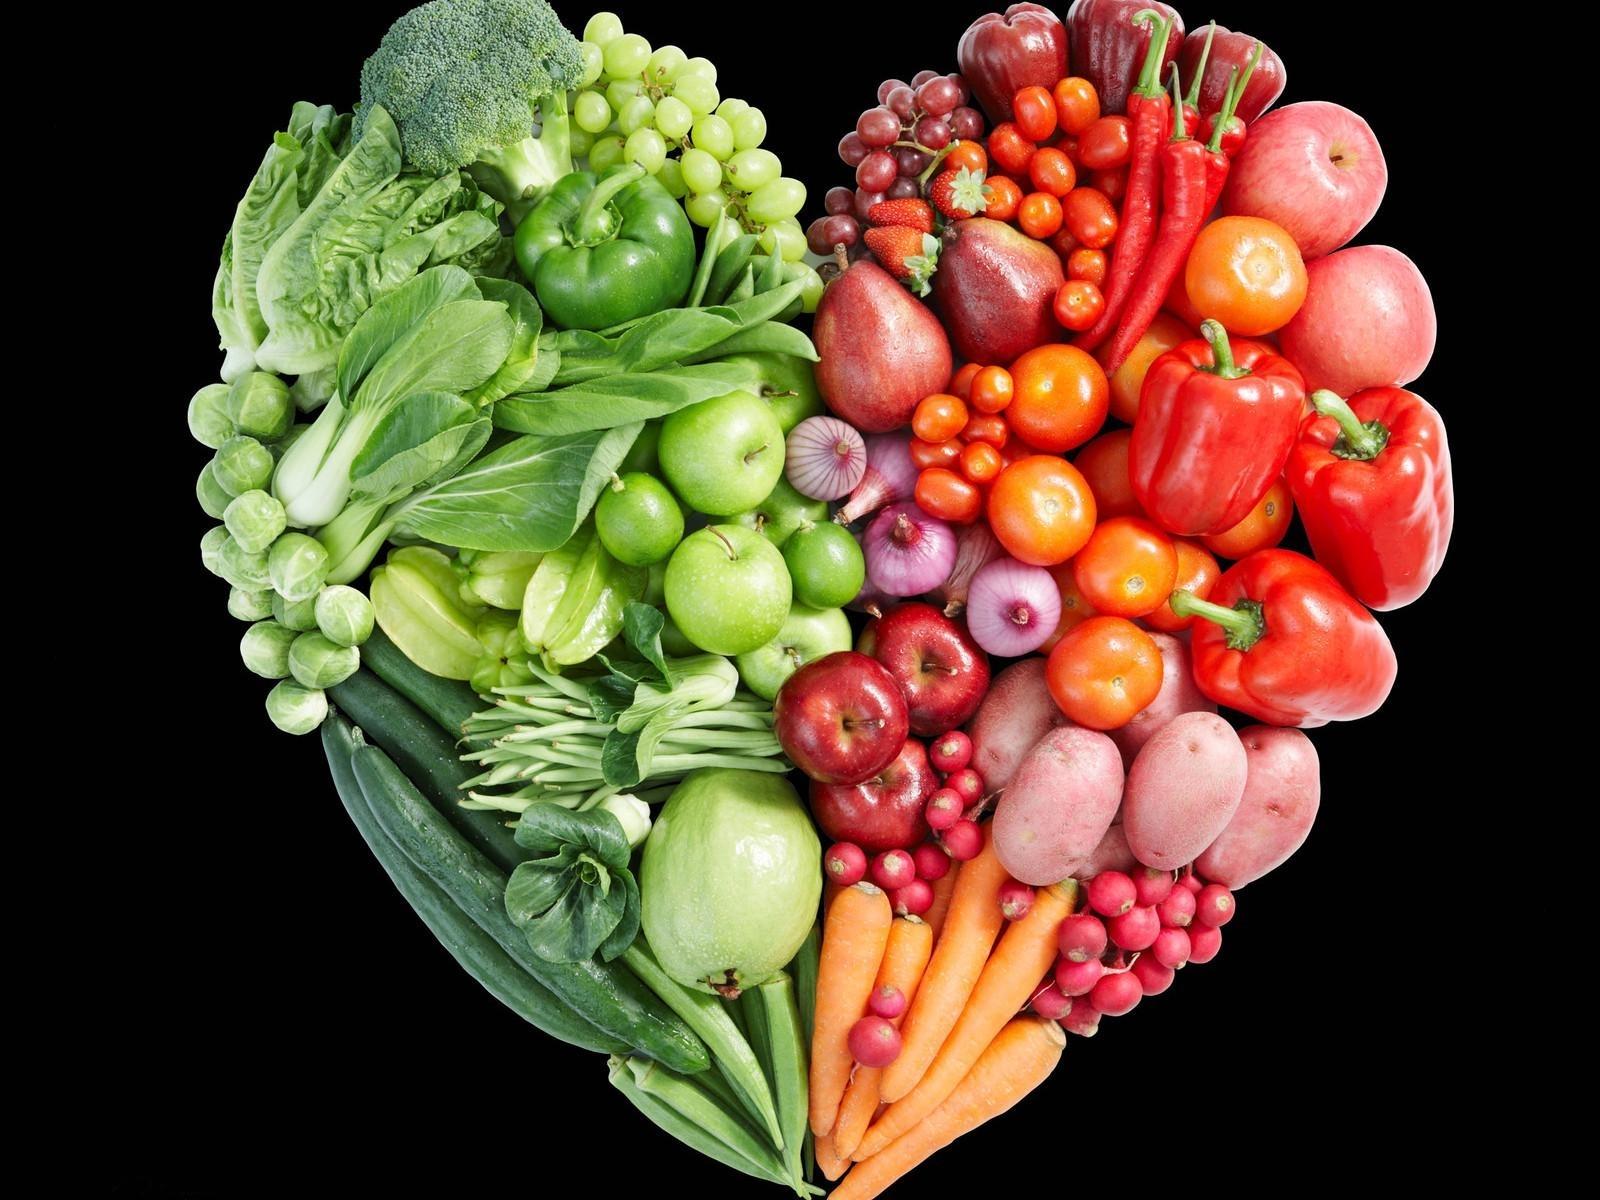 fruit and vegetables Computer Wallpapers Desktop Backgrounds 1600x1200